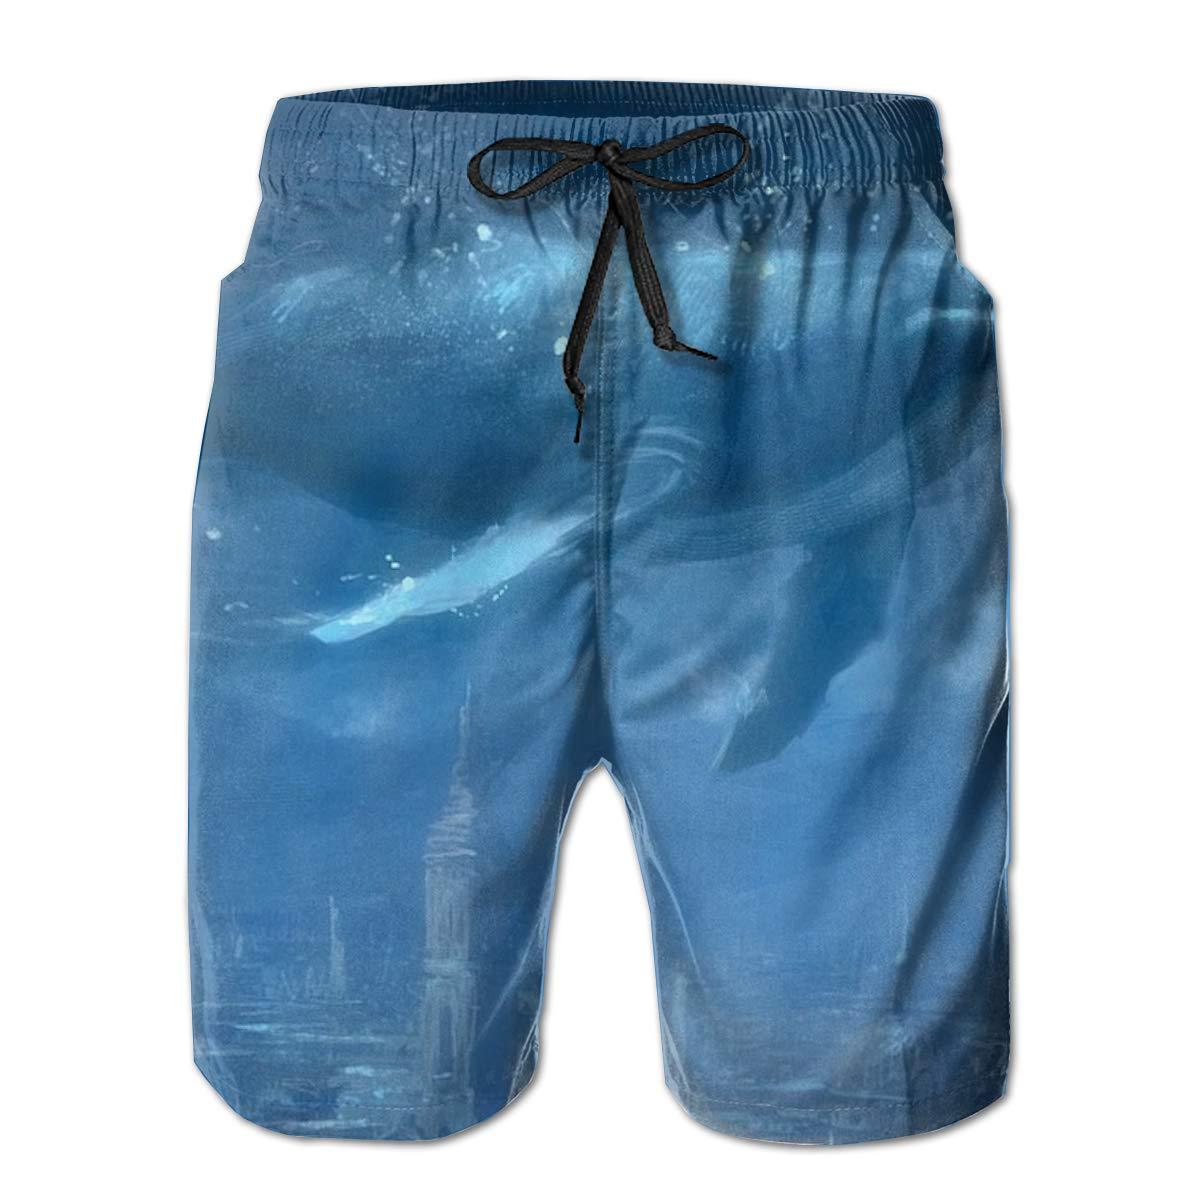 Big Shark Summer Holiday Mesh Lining Swimwear Board Shorts with Pockets Mens Beach Shorts Quick Dry